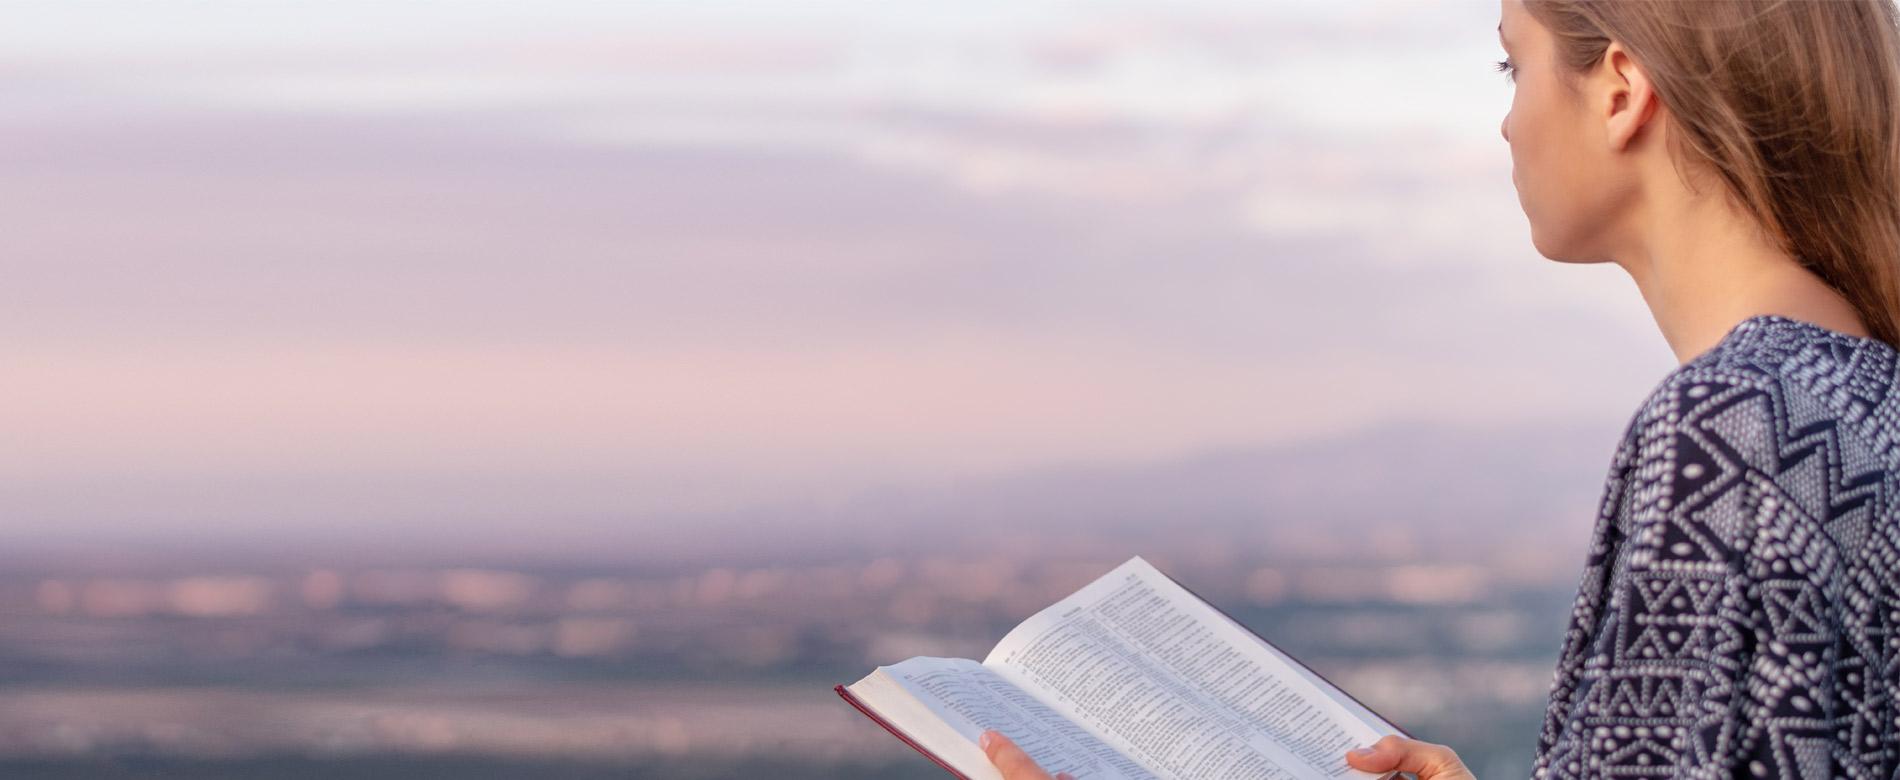 Resposta aos internautas – Átrio ou altar?